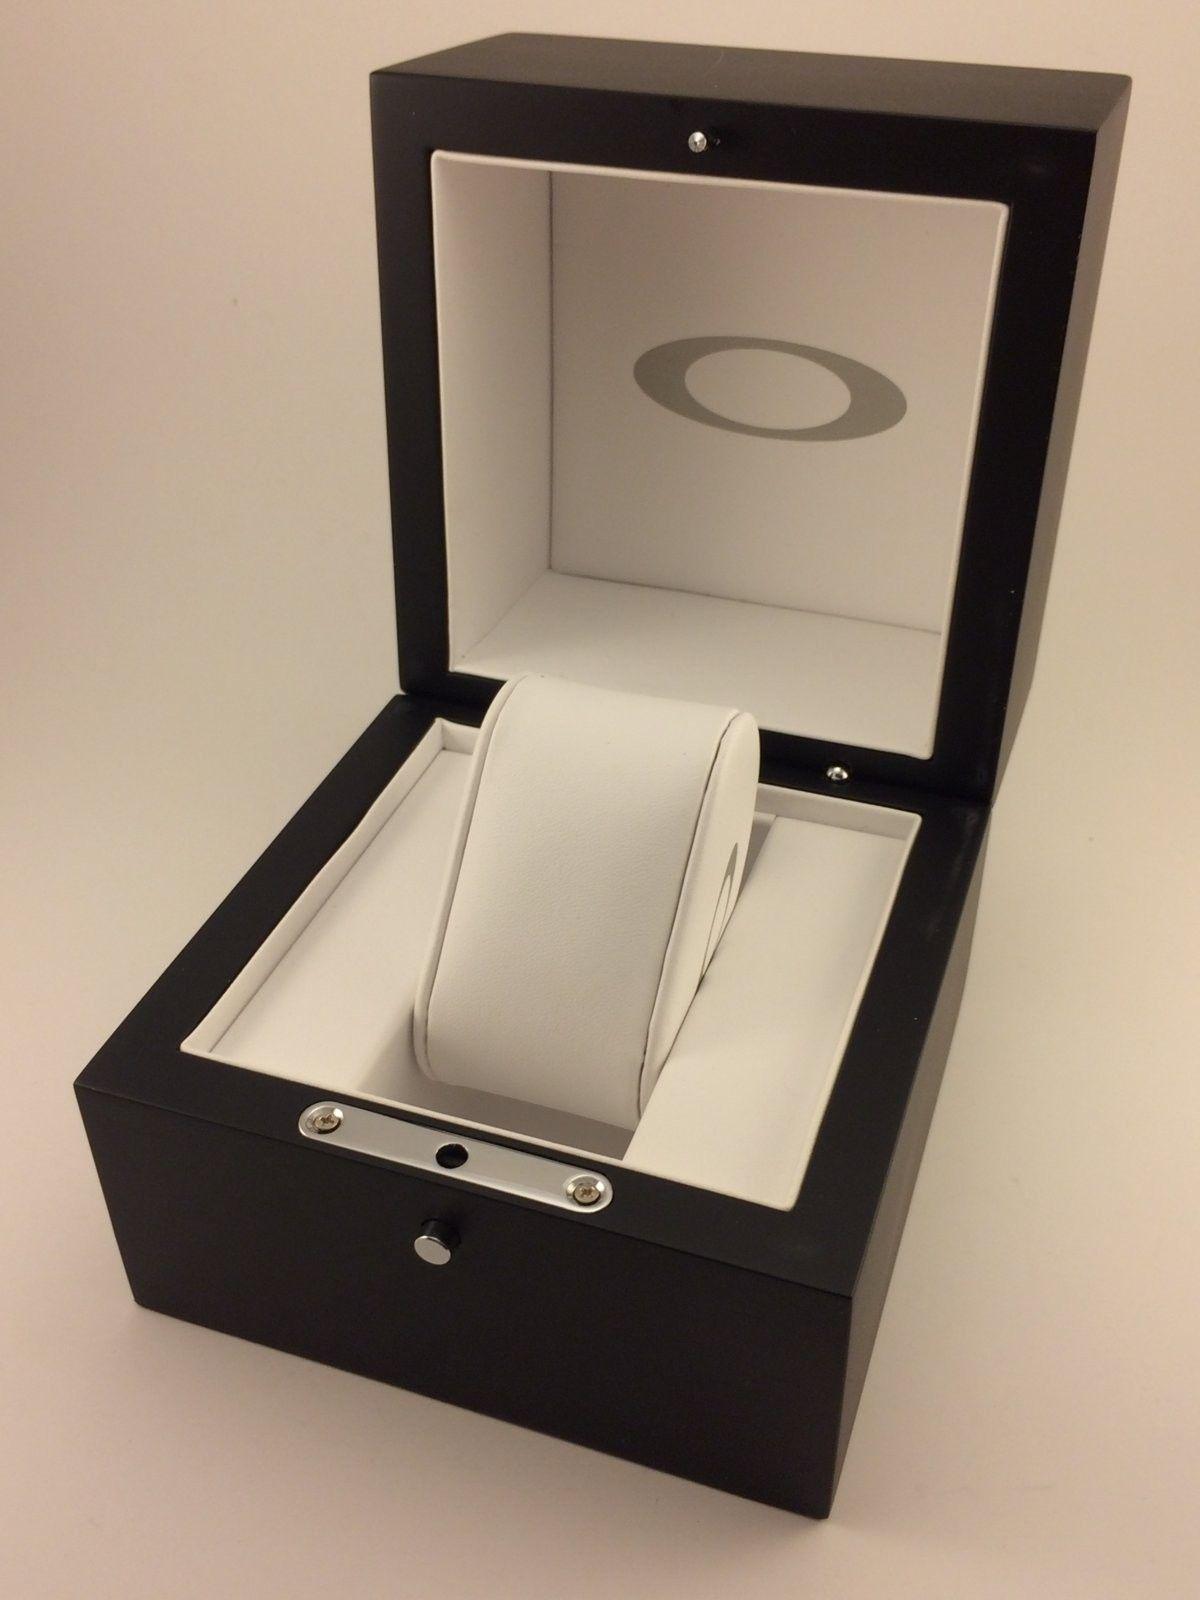 Minute Machine Wooden Box - MM box 704.JPG